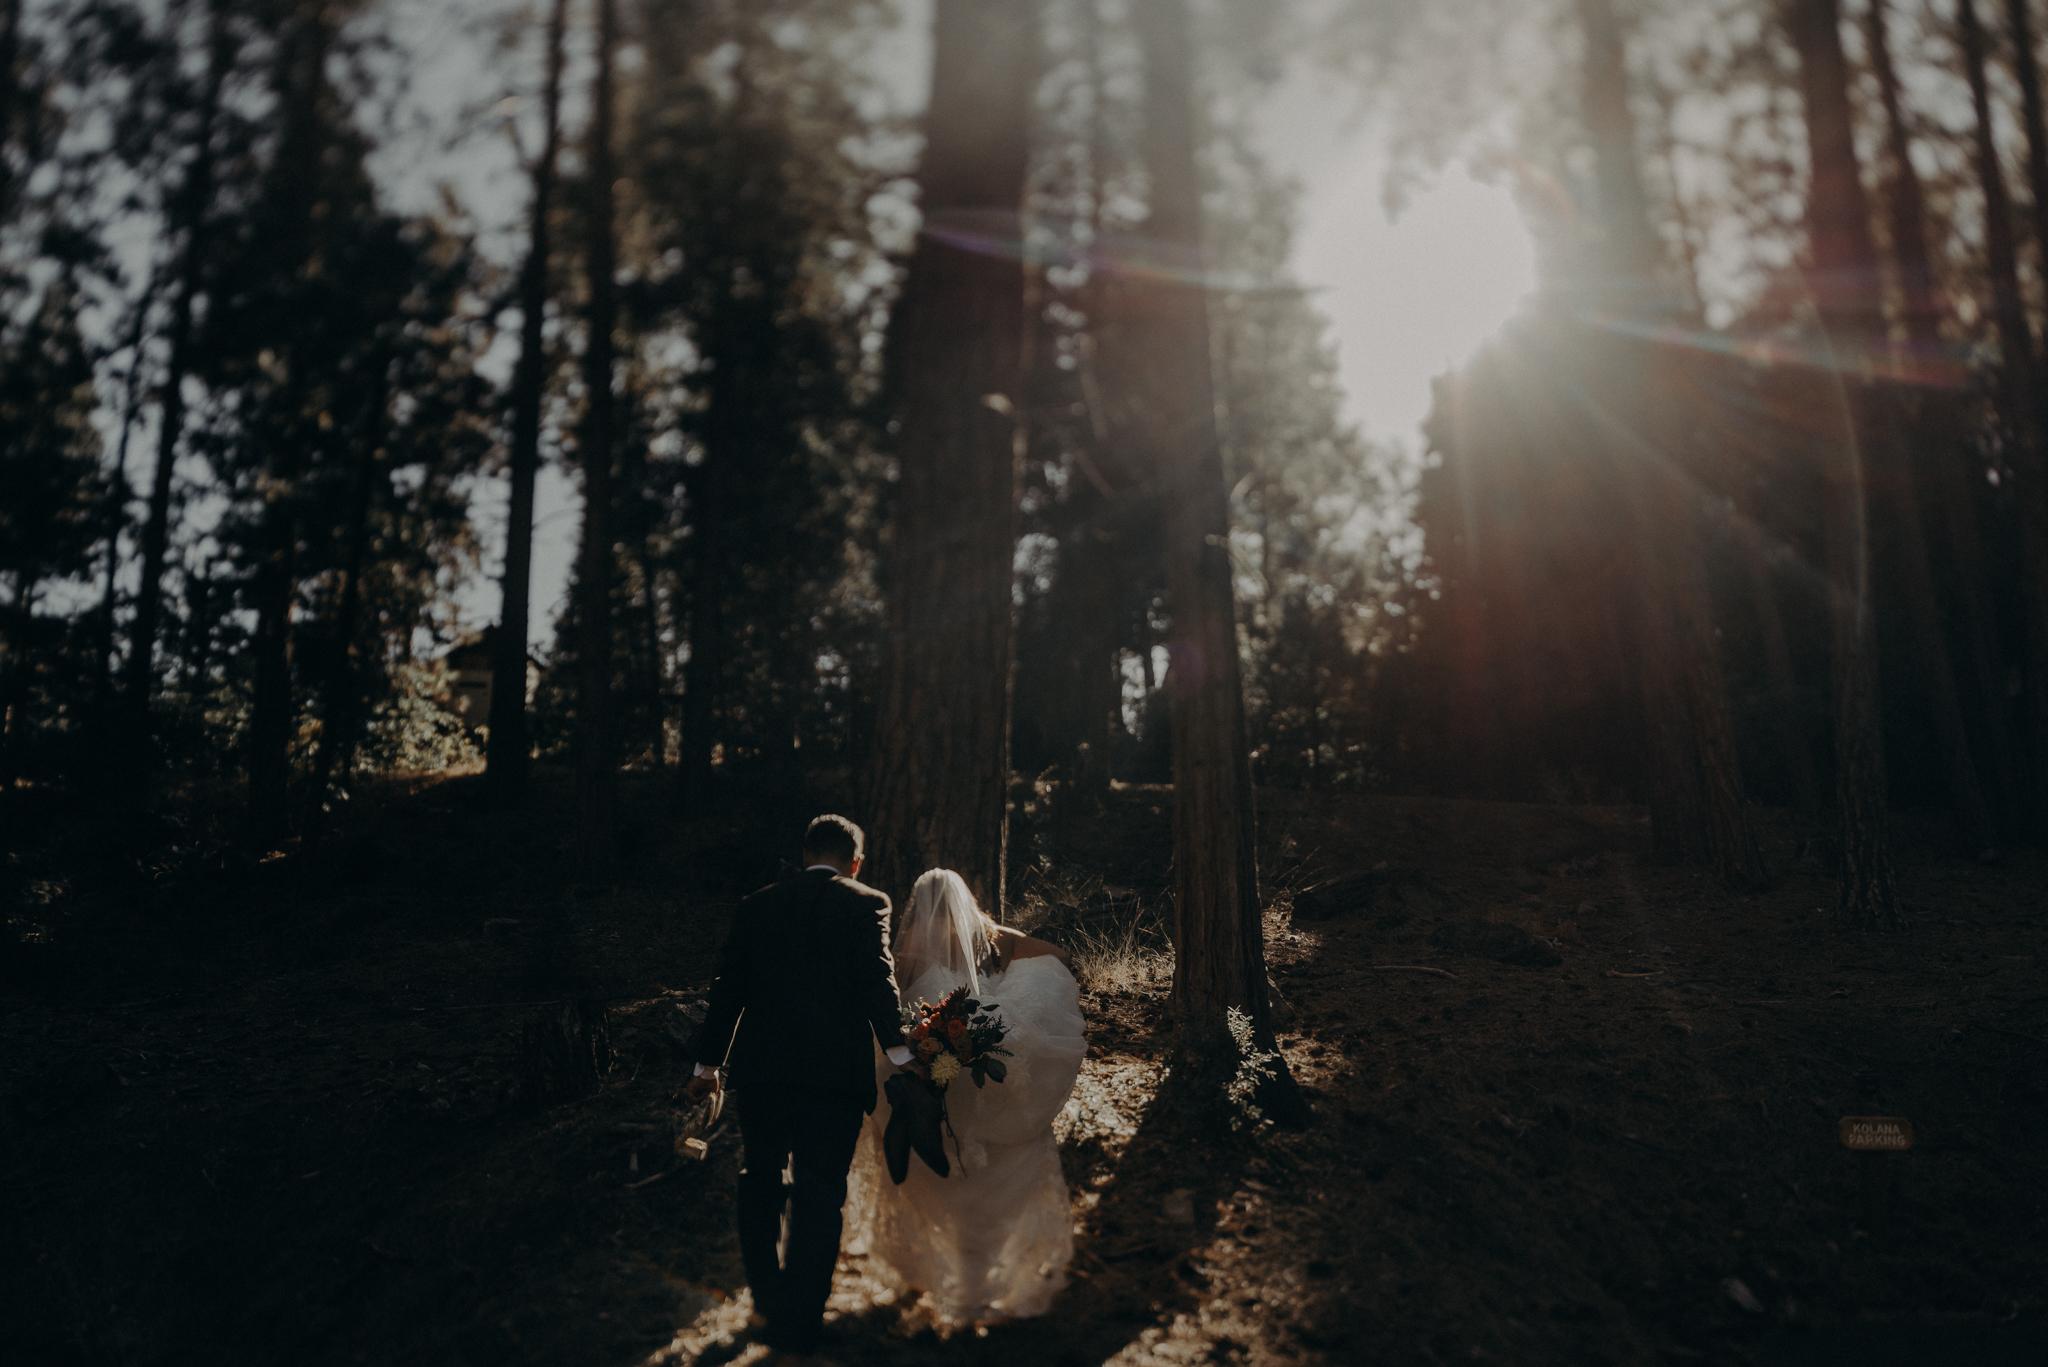 Yosemite Elopement Photographer - Evergreen Lodge Wedding Photographer - IsaiahAndTaylor.com-110.jpg